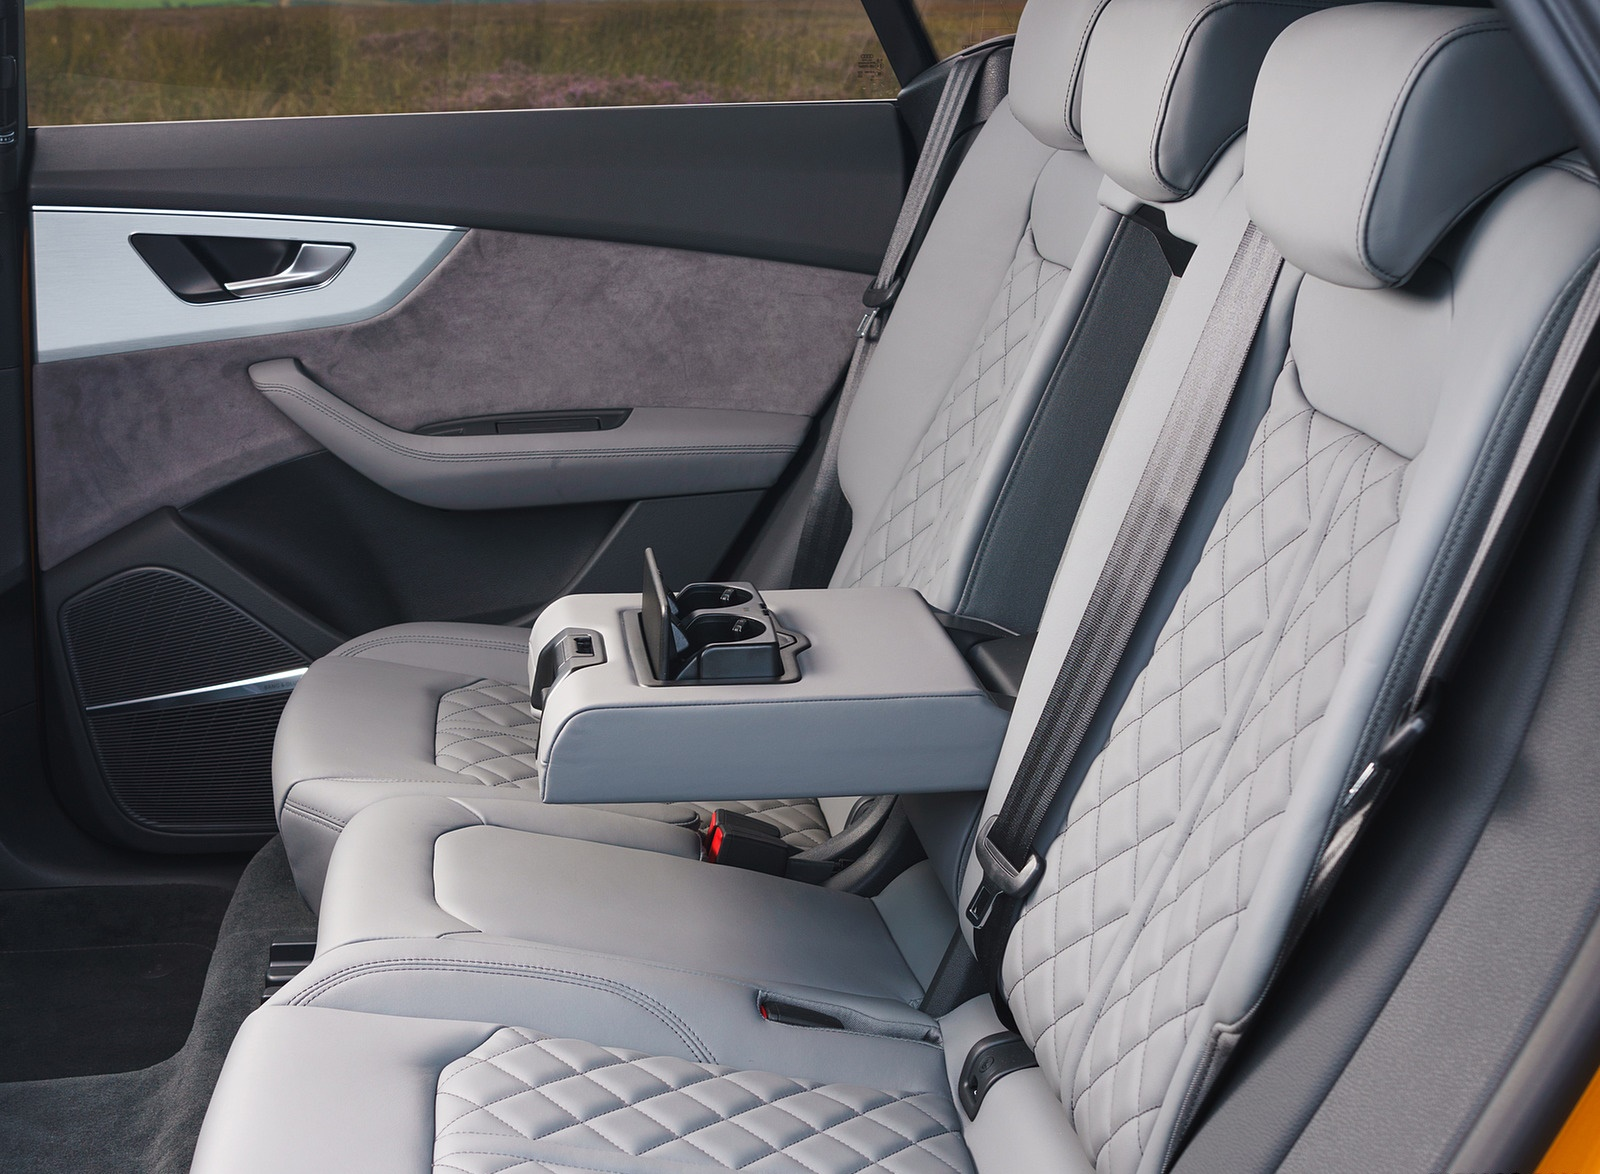 2019 Audi Q8 S Line 50 Tdi Quattro Uk Spec Interior Rear Seats Wallpapers 88 Newcarcars